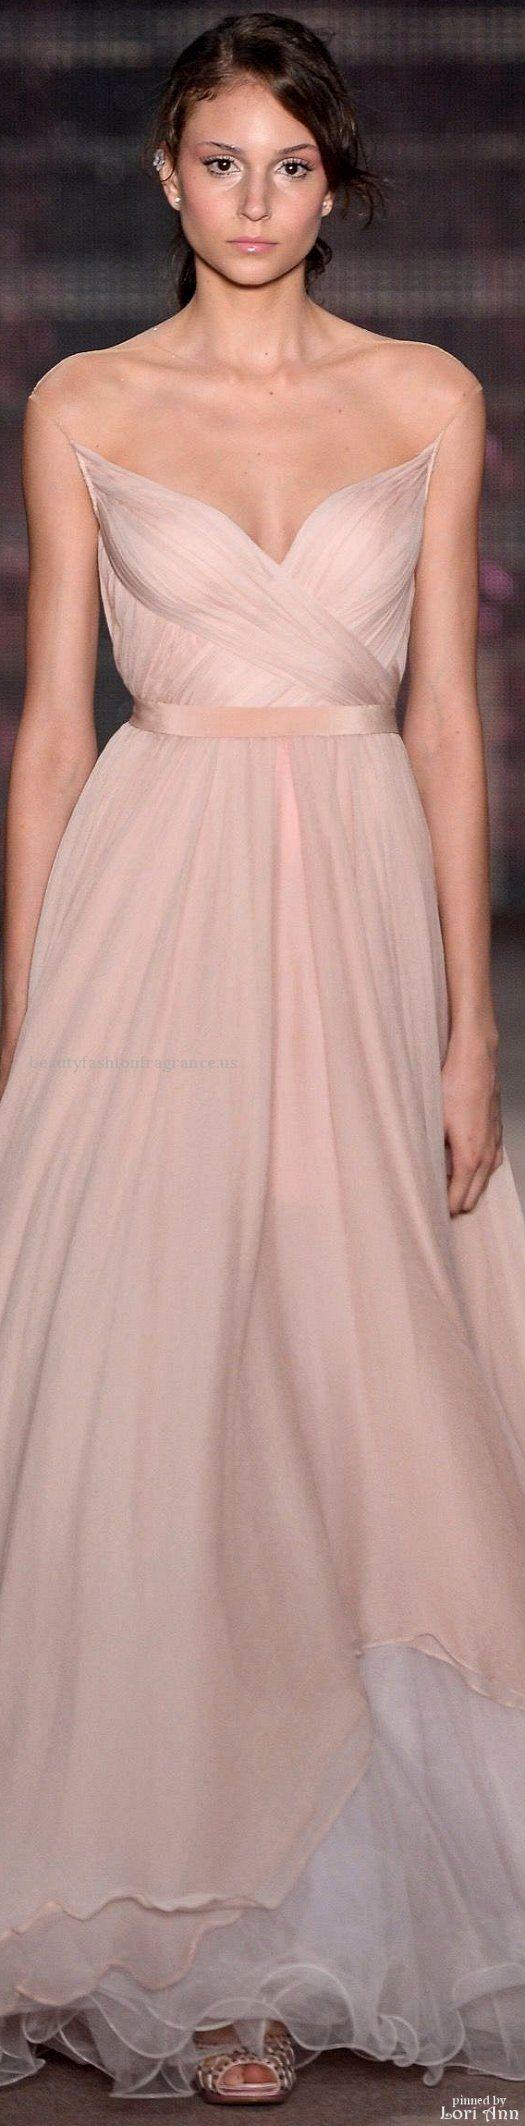 195 best Beautiful Dresses images on Pinterest | Woman fashion ...